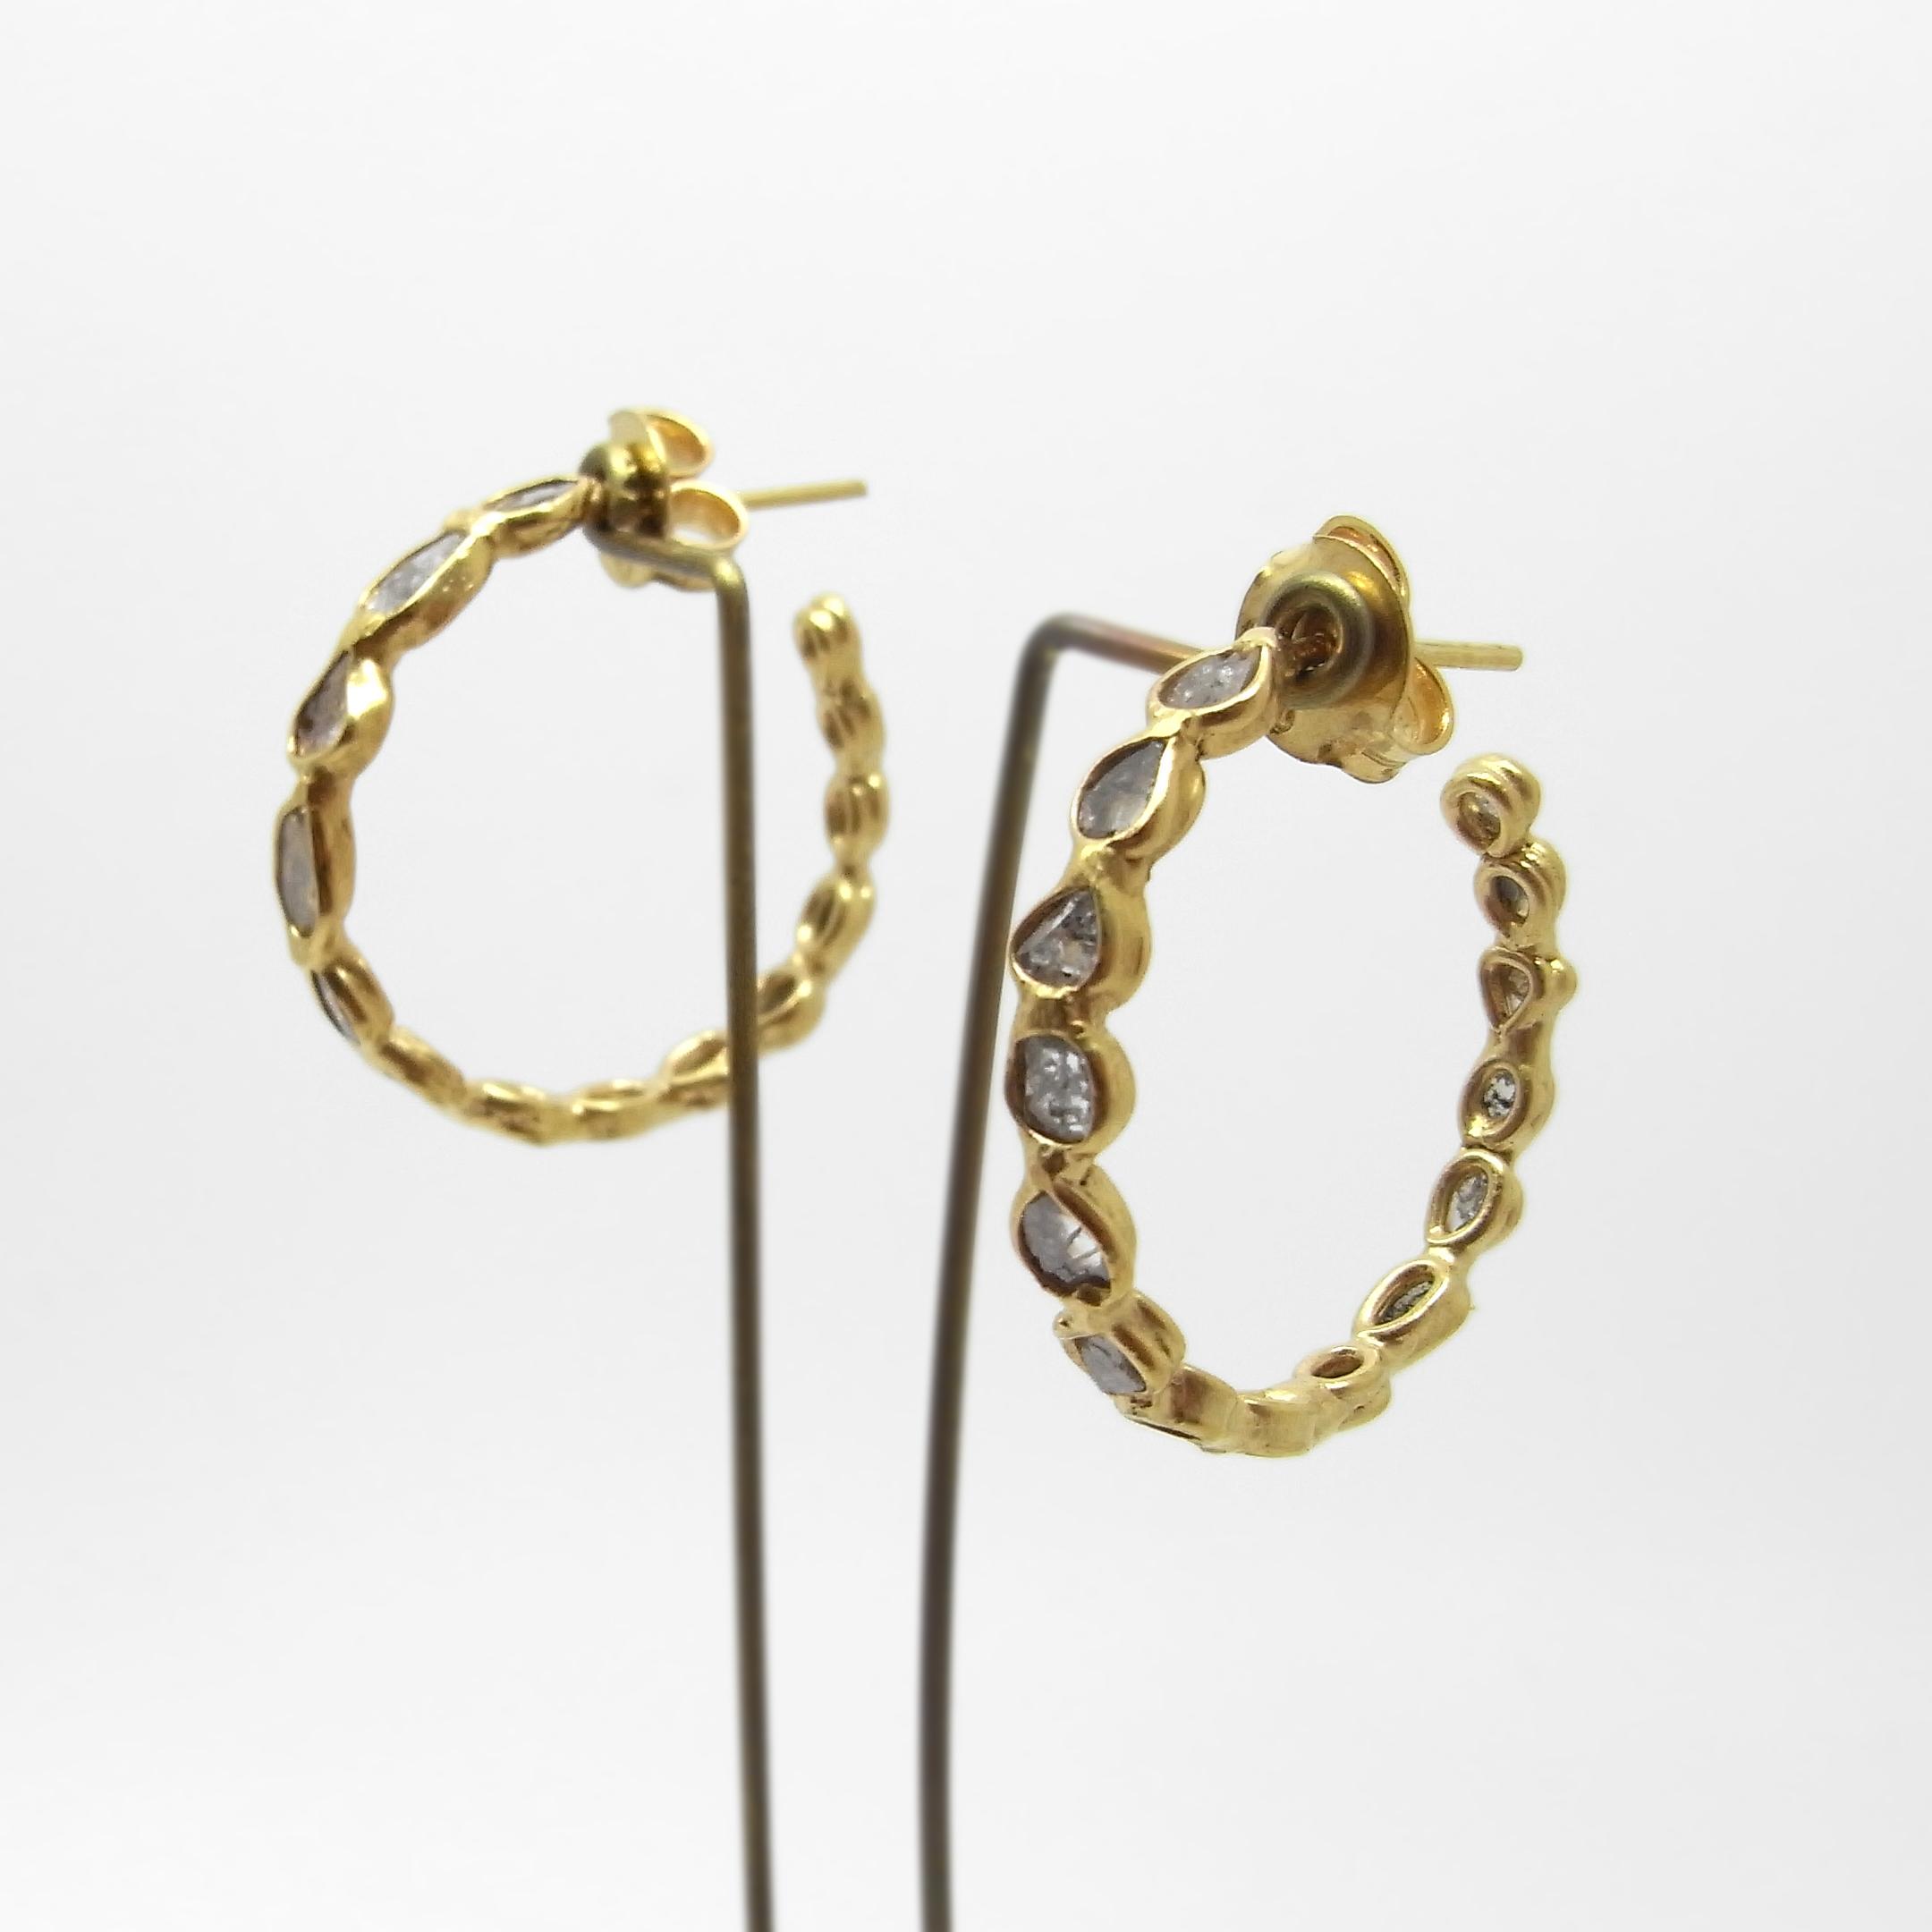 Diamond Earrings - Gold Plated